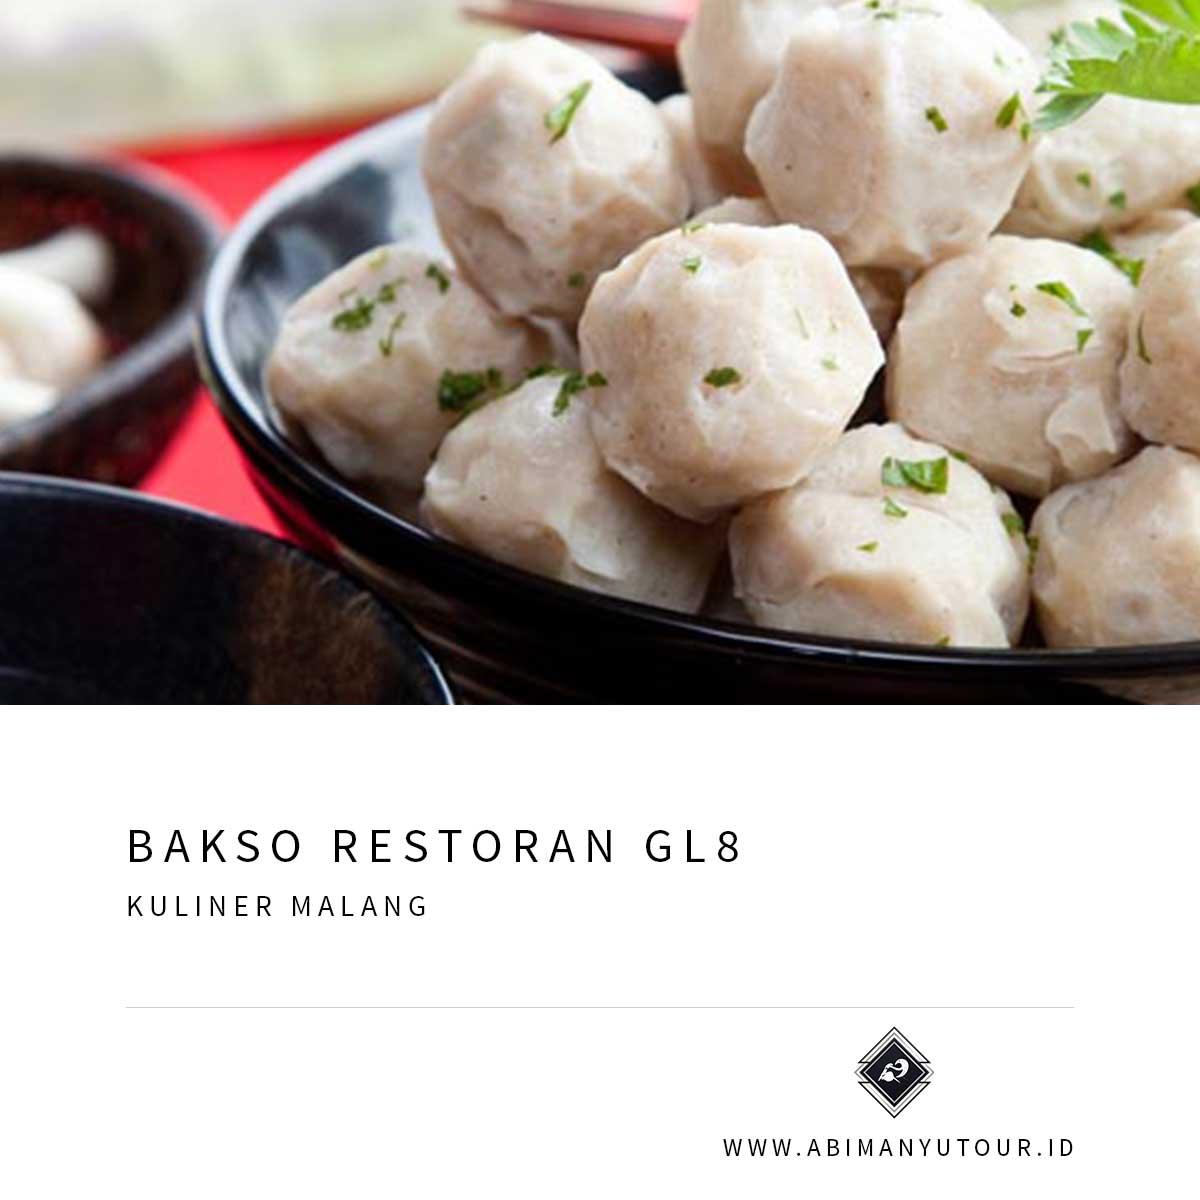 Bakso Restoran GL8